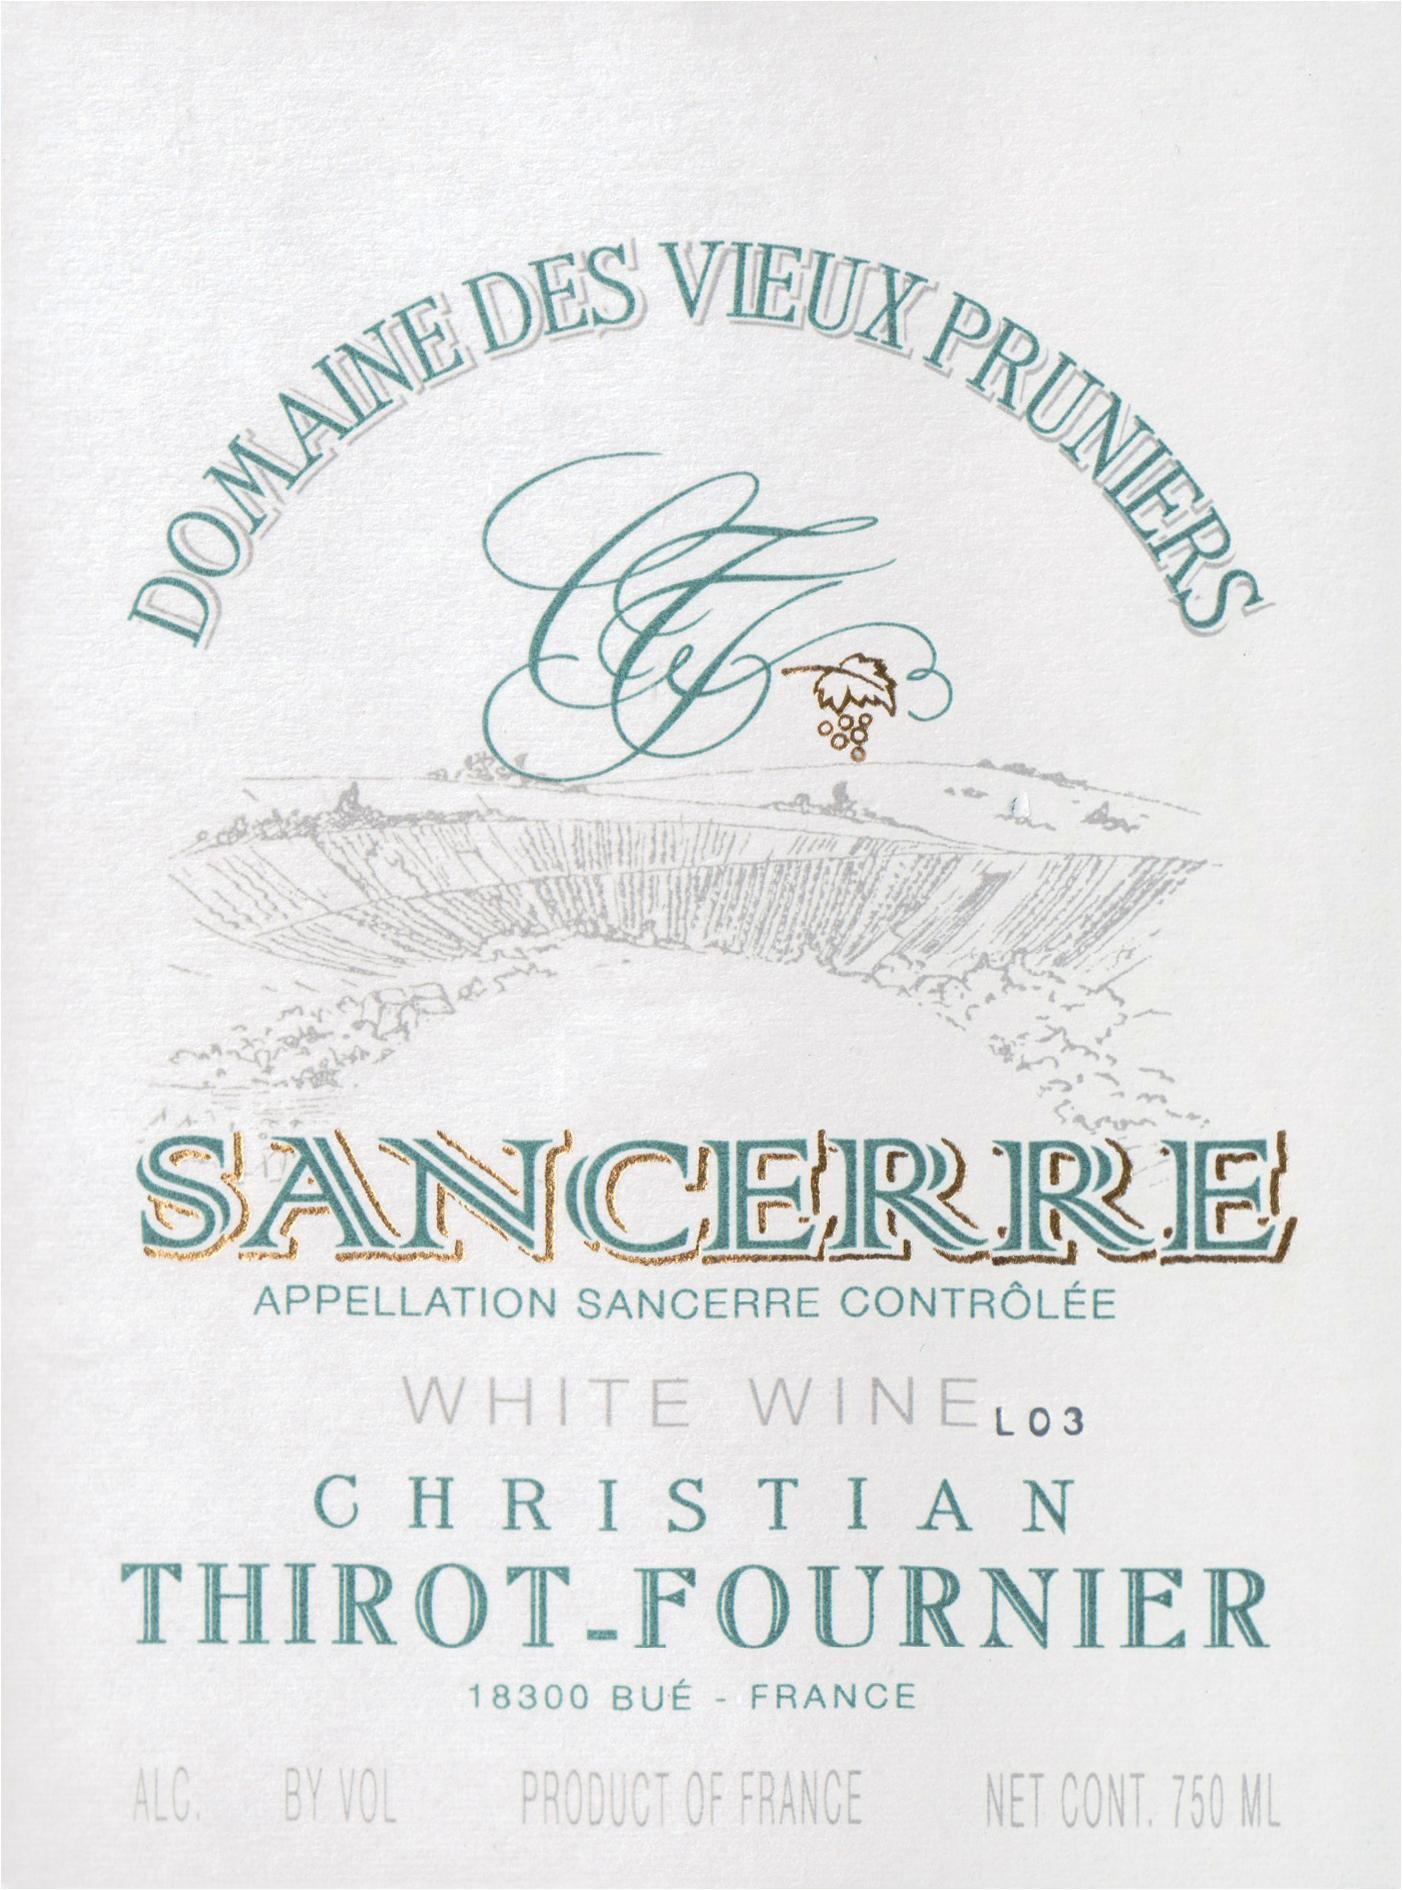 Vieux Pruniers Sancerre 2019